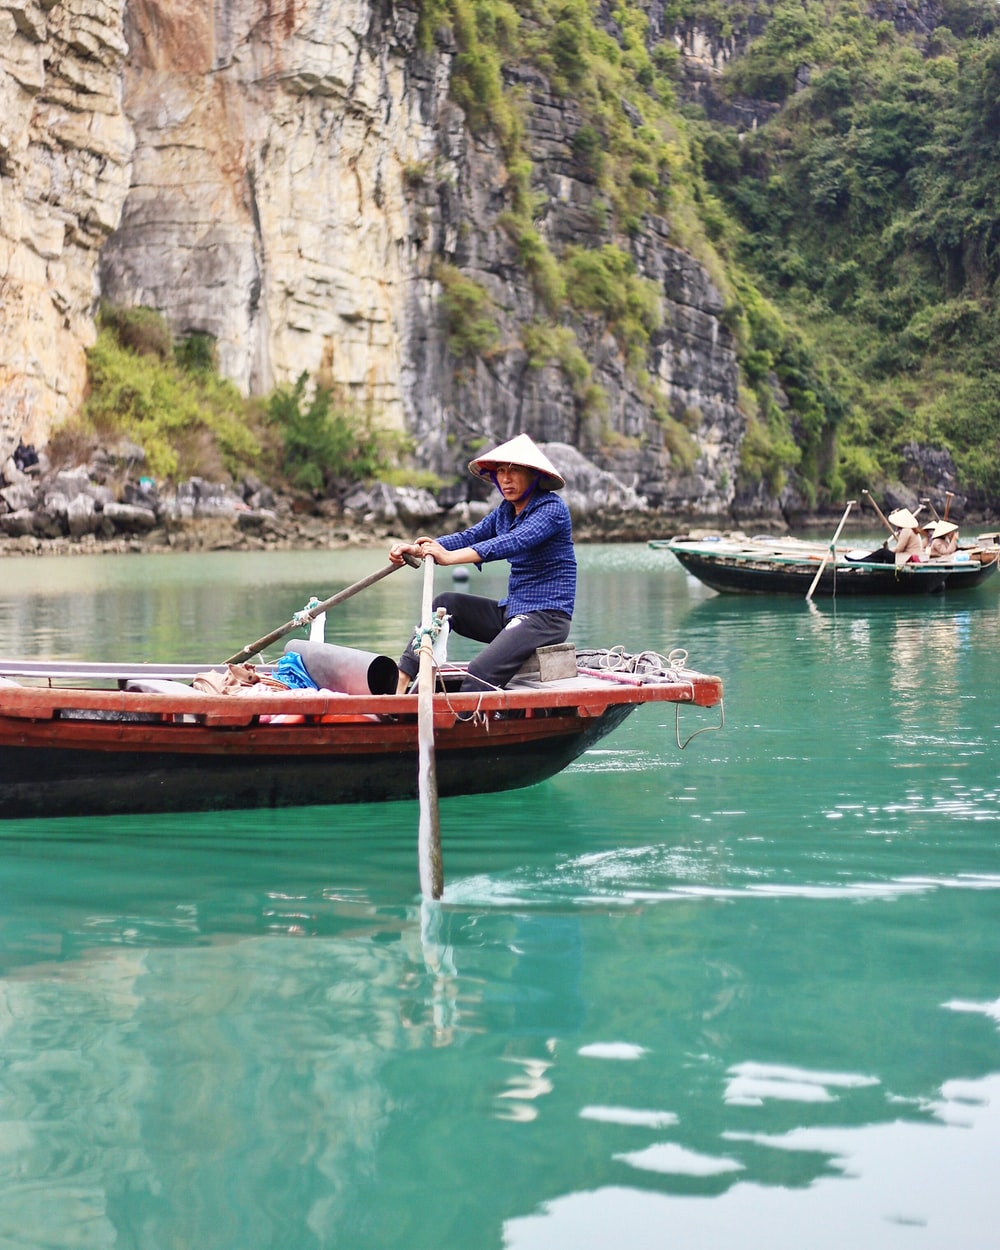 man riding boat